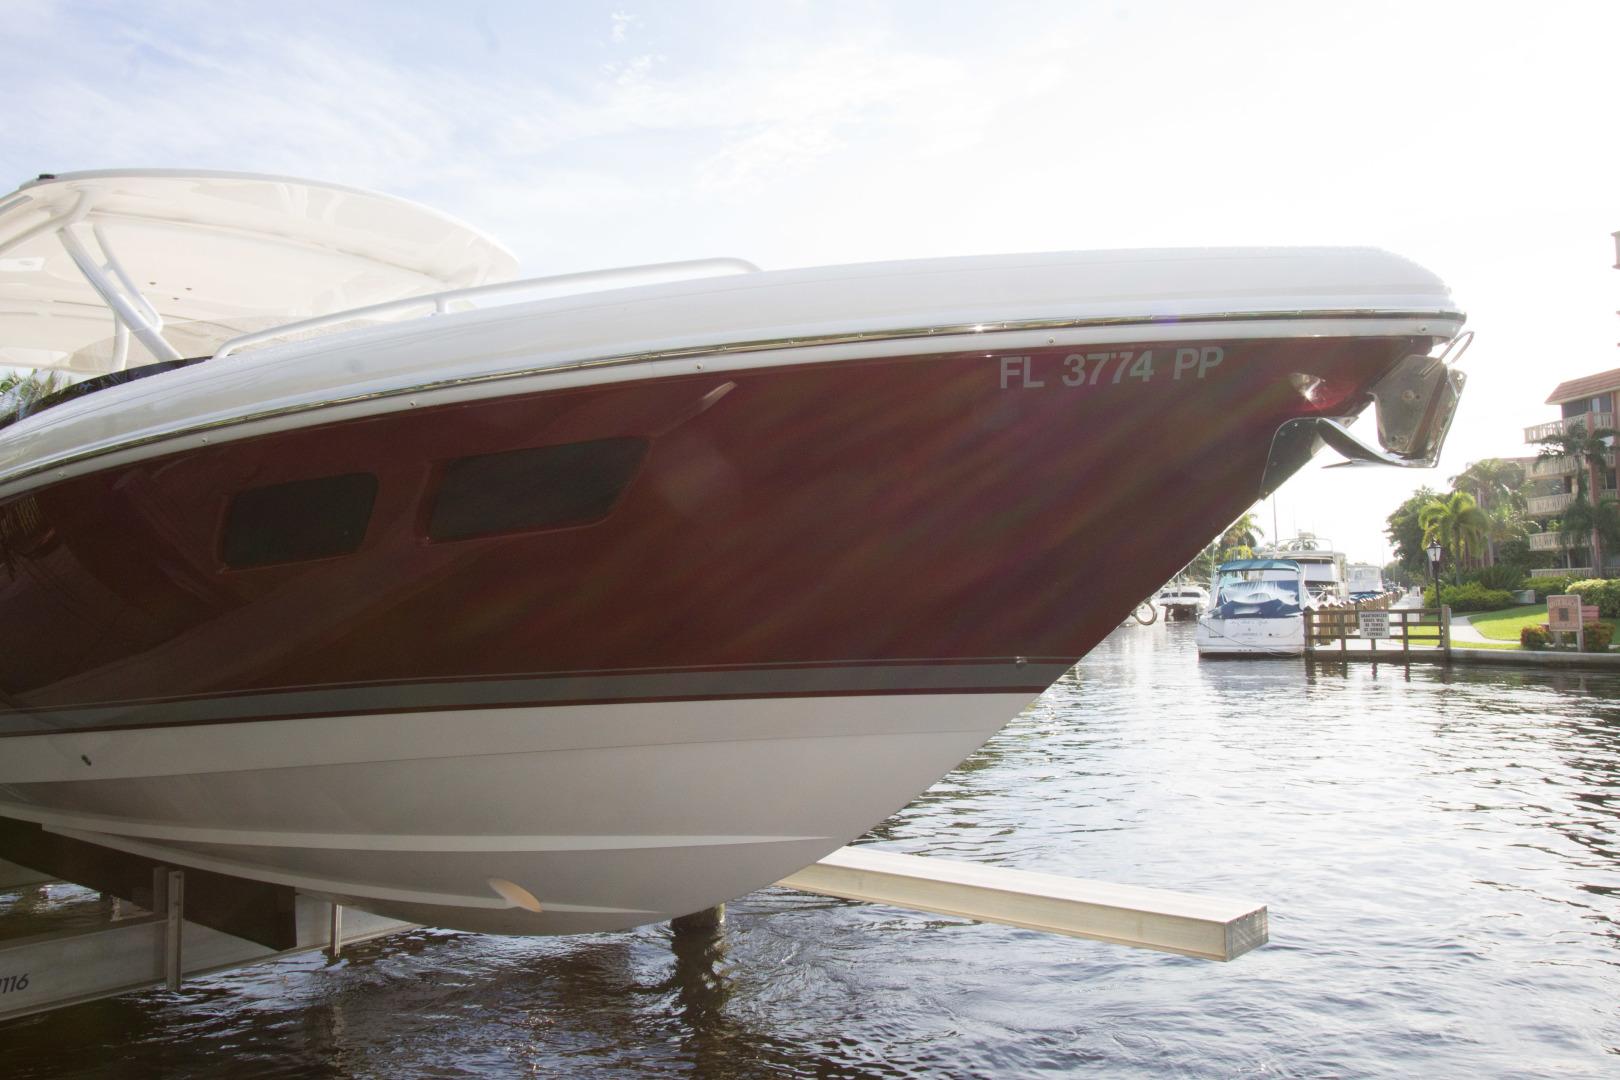 Intrepid-375 Walkaround 2014-NN 375 Walkaround 2014 Fort Lauderdale-Florida-United States-1507866 | Thumbnail